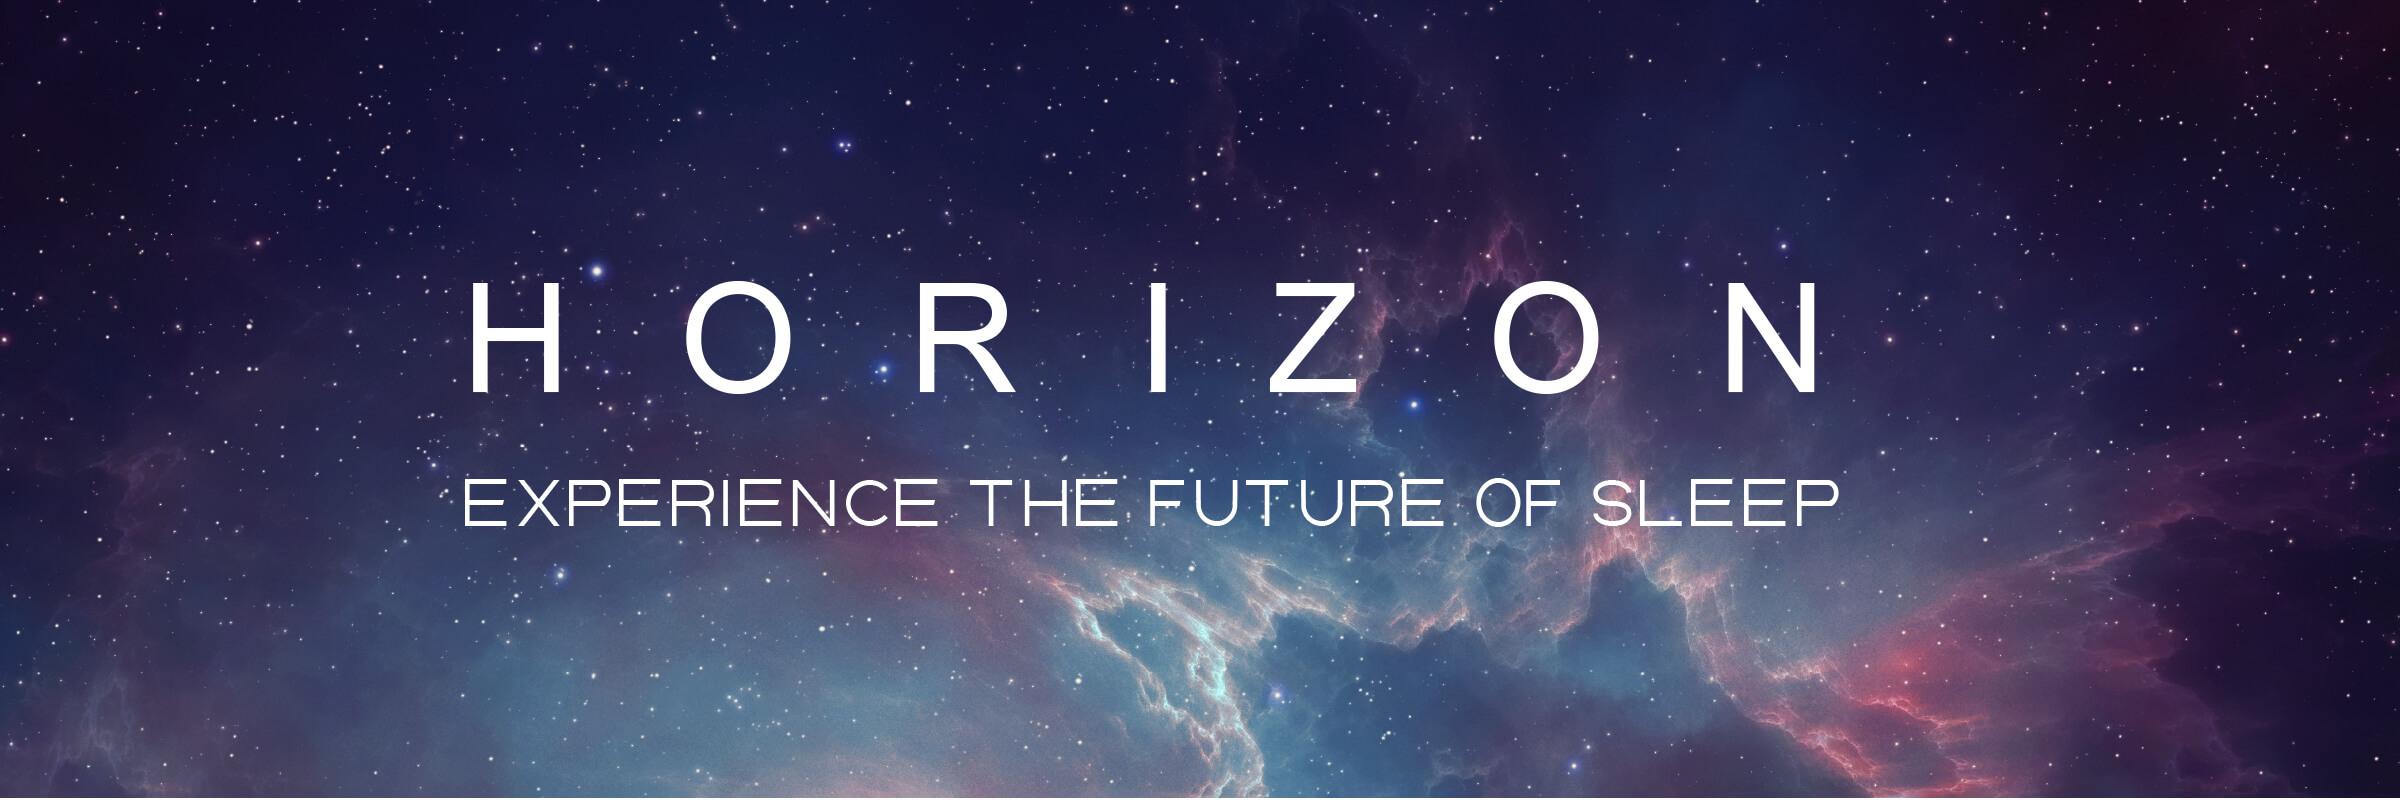 Horizon Mattresses - experience the future of sleep